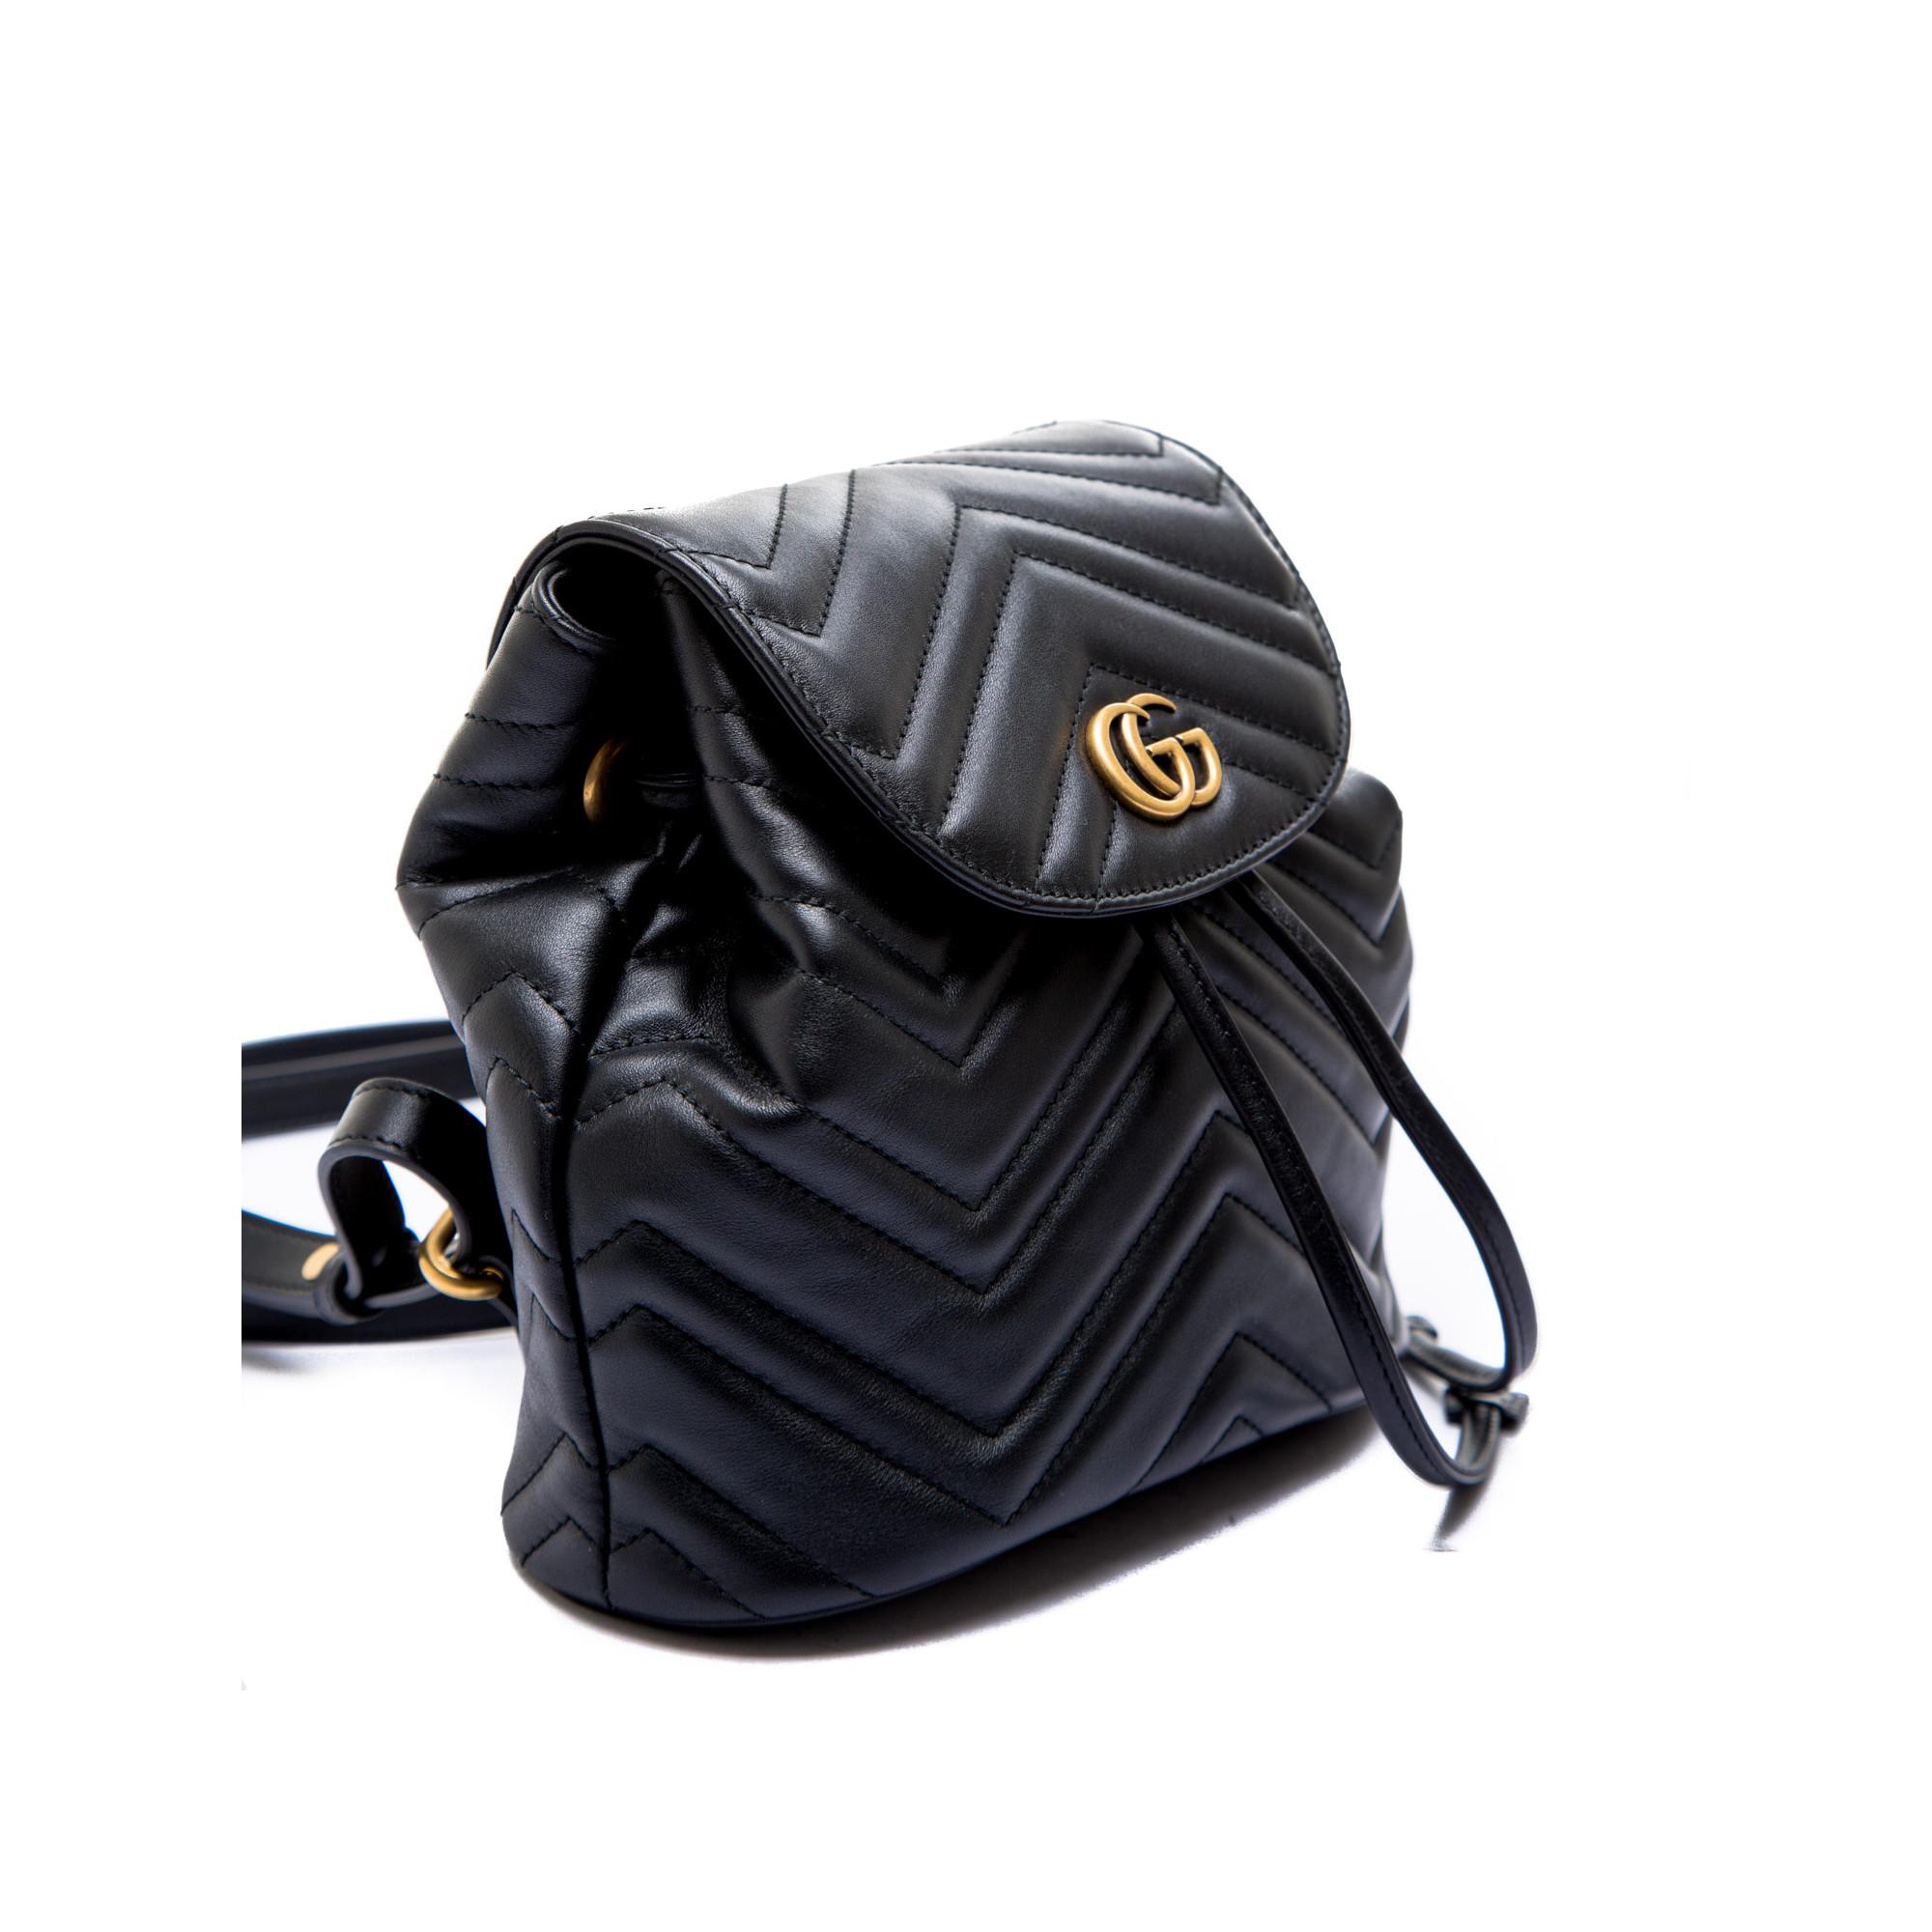 2859732c0dc ... Gucci backpack gg marmont black Gucci backpack gg marmont black -  www.derodeloper.com